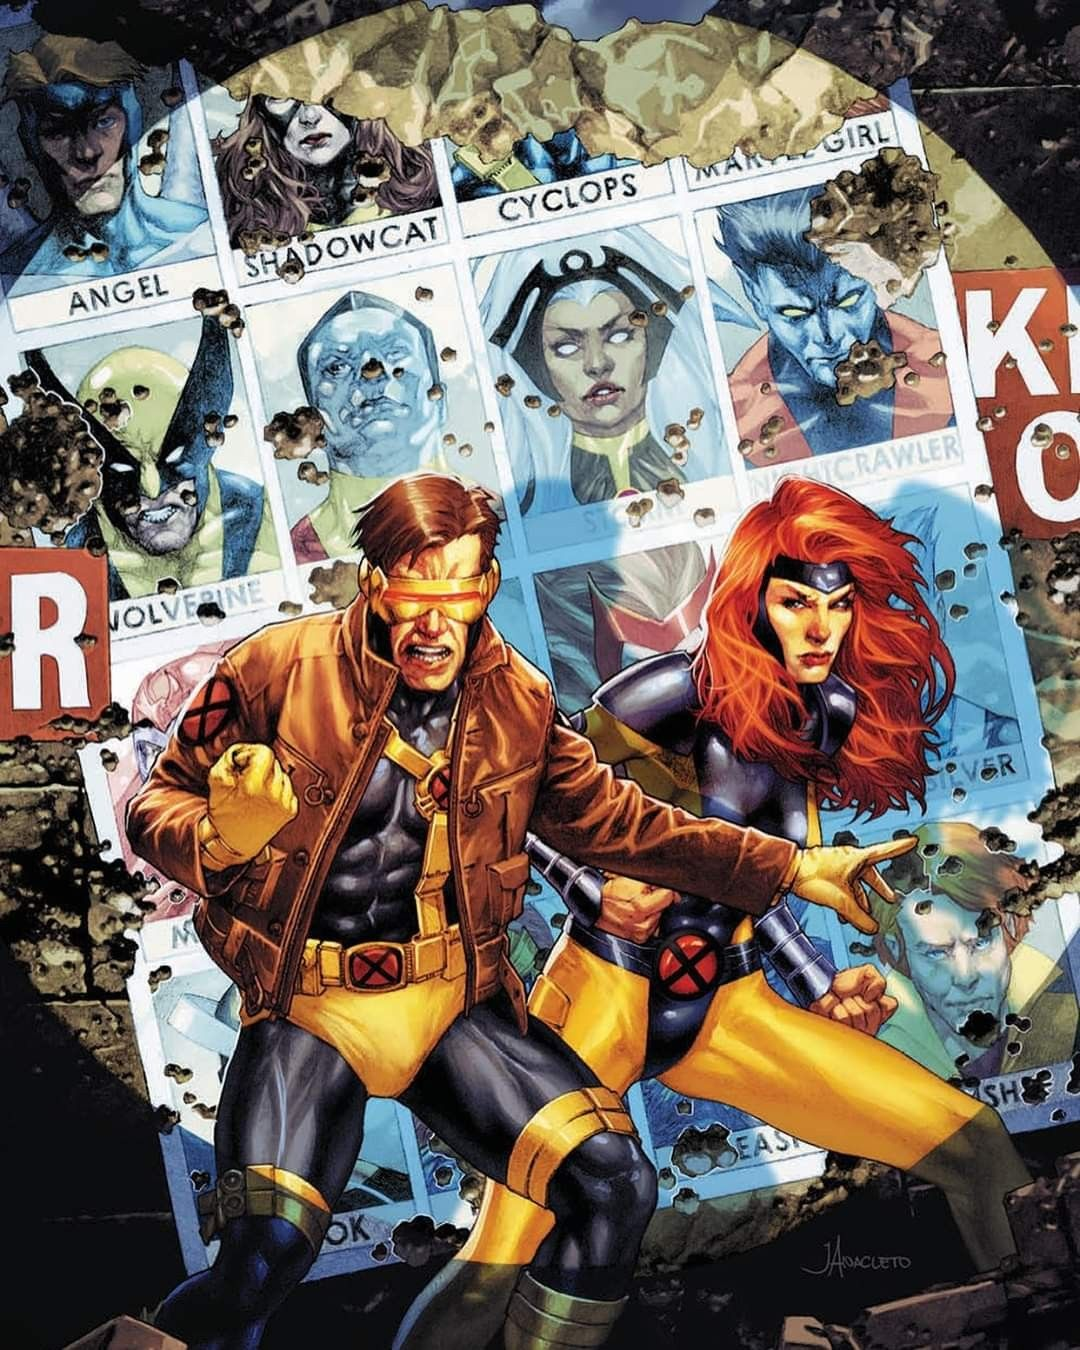 Pin By Mortem On Comics Marvel In 2020 Comics X Men Marvel Comics